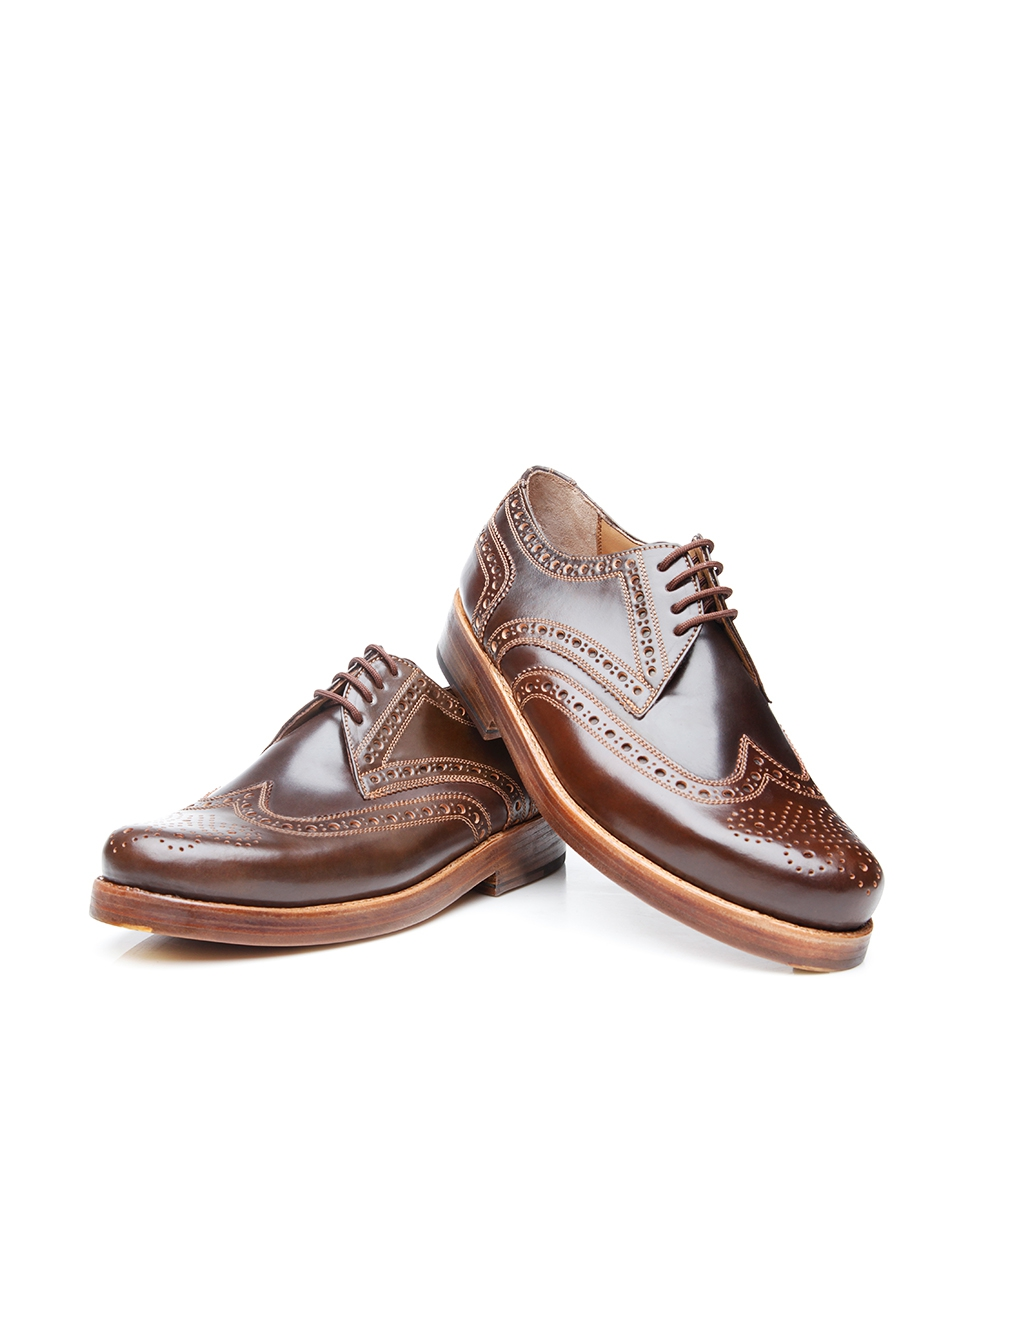 54d36045840 Budapest men's shoe in shell cordovan